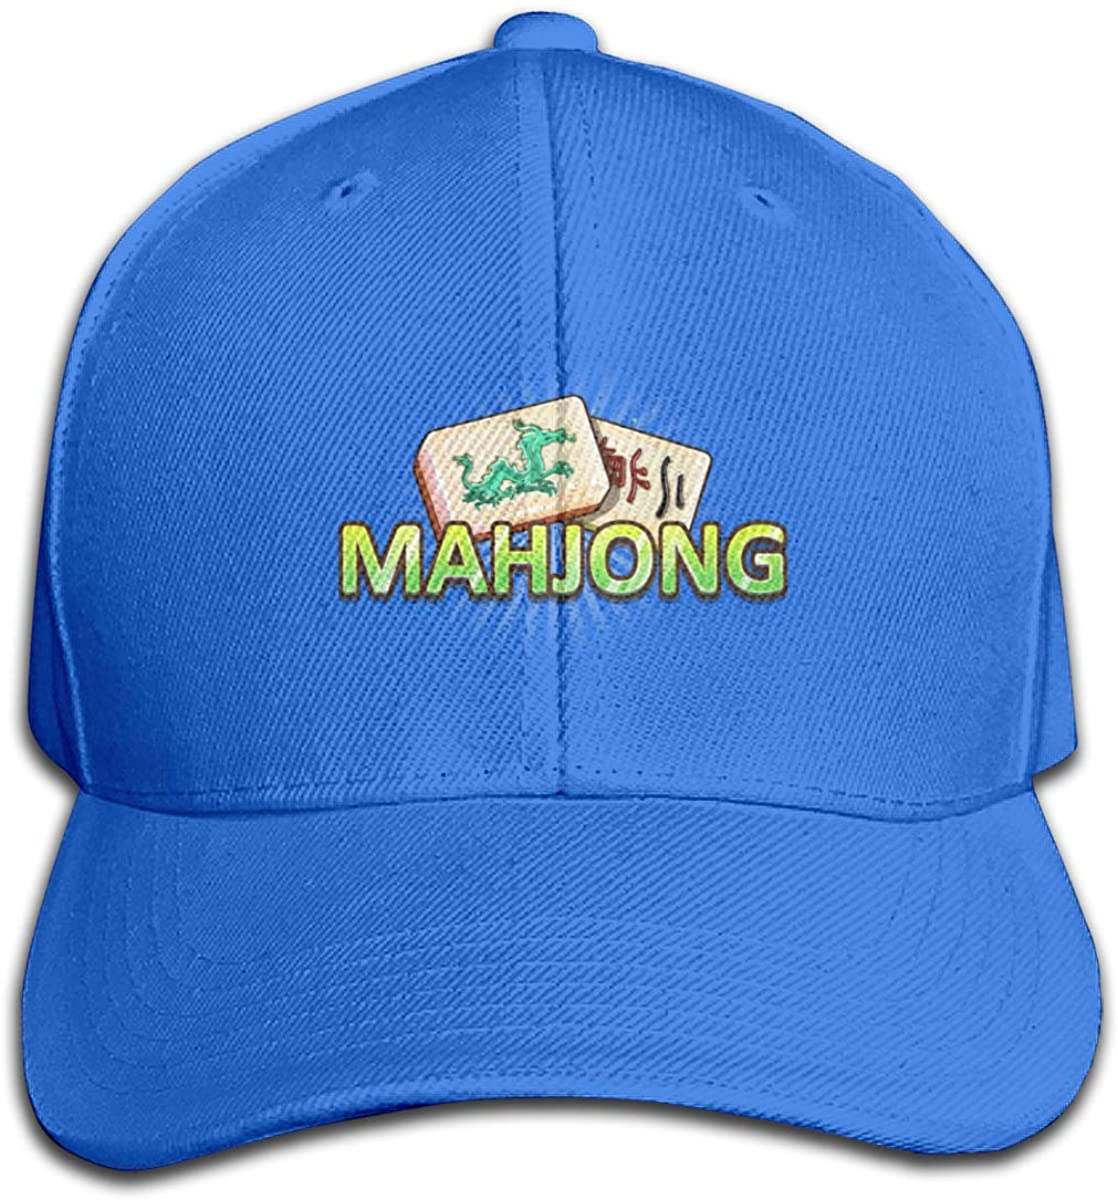 Quafoo Mahjong Sign Logo Outdoor Baseball Cotton Snapback Adjustable Hat for Unisex Navy